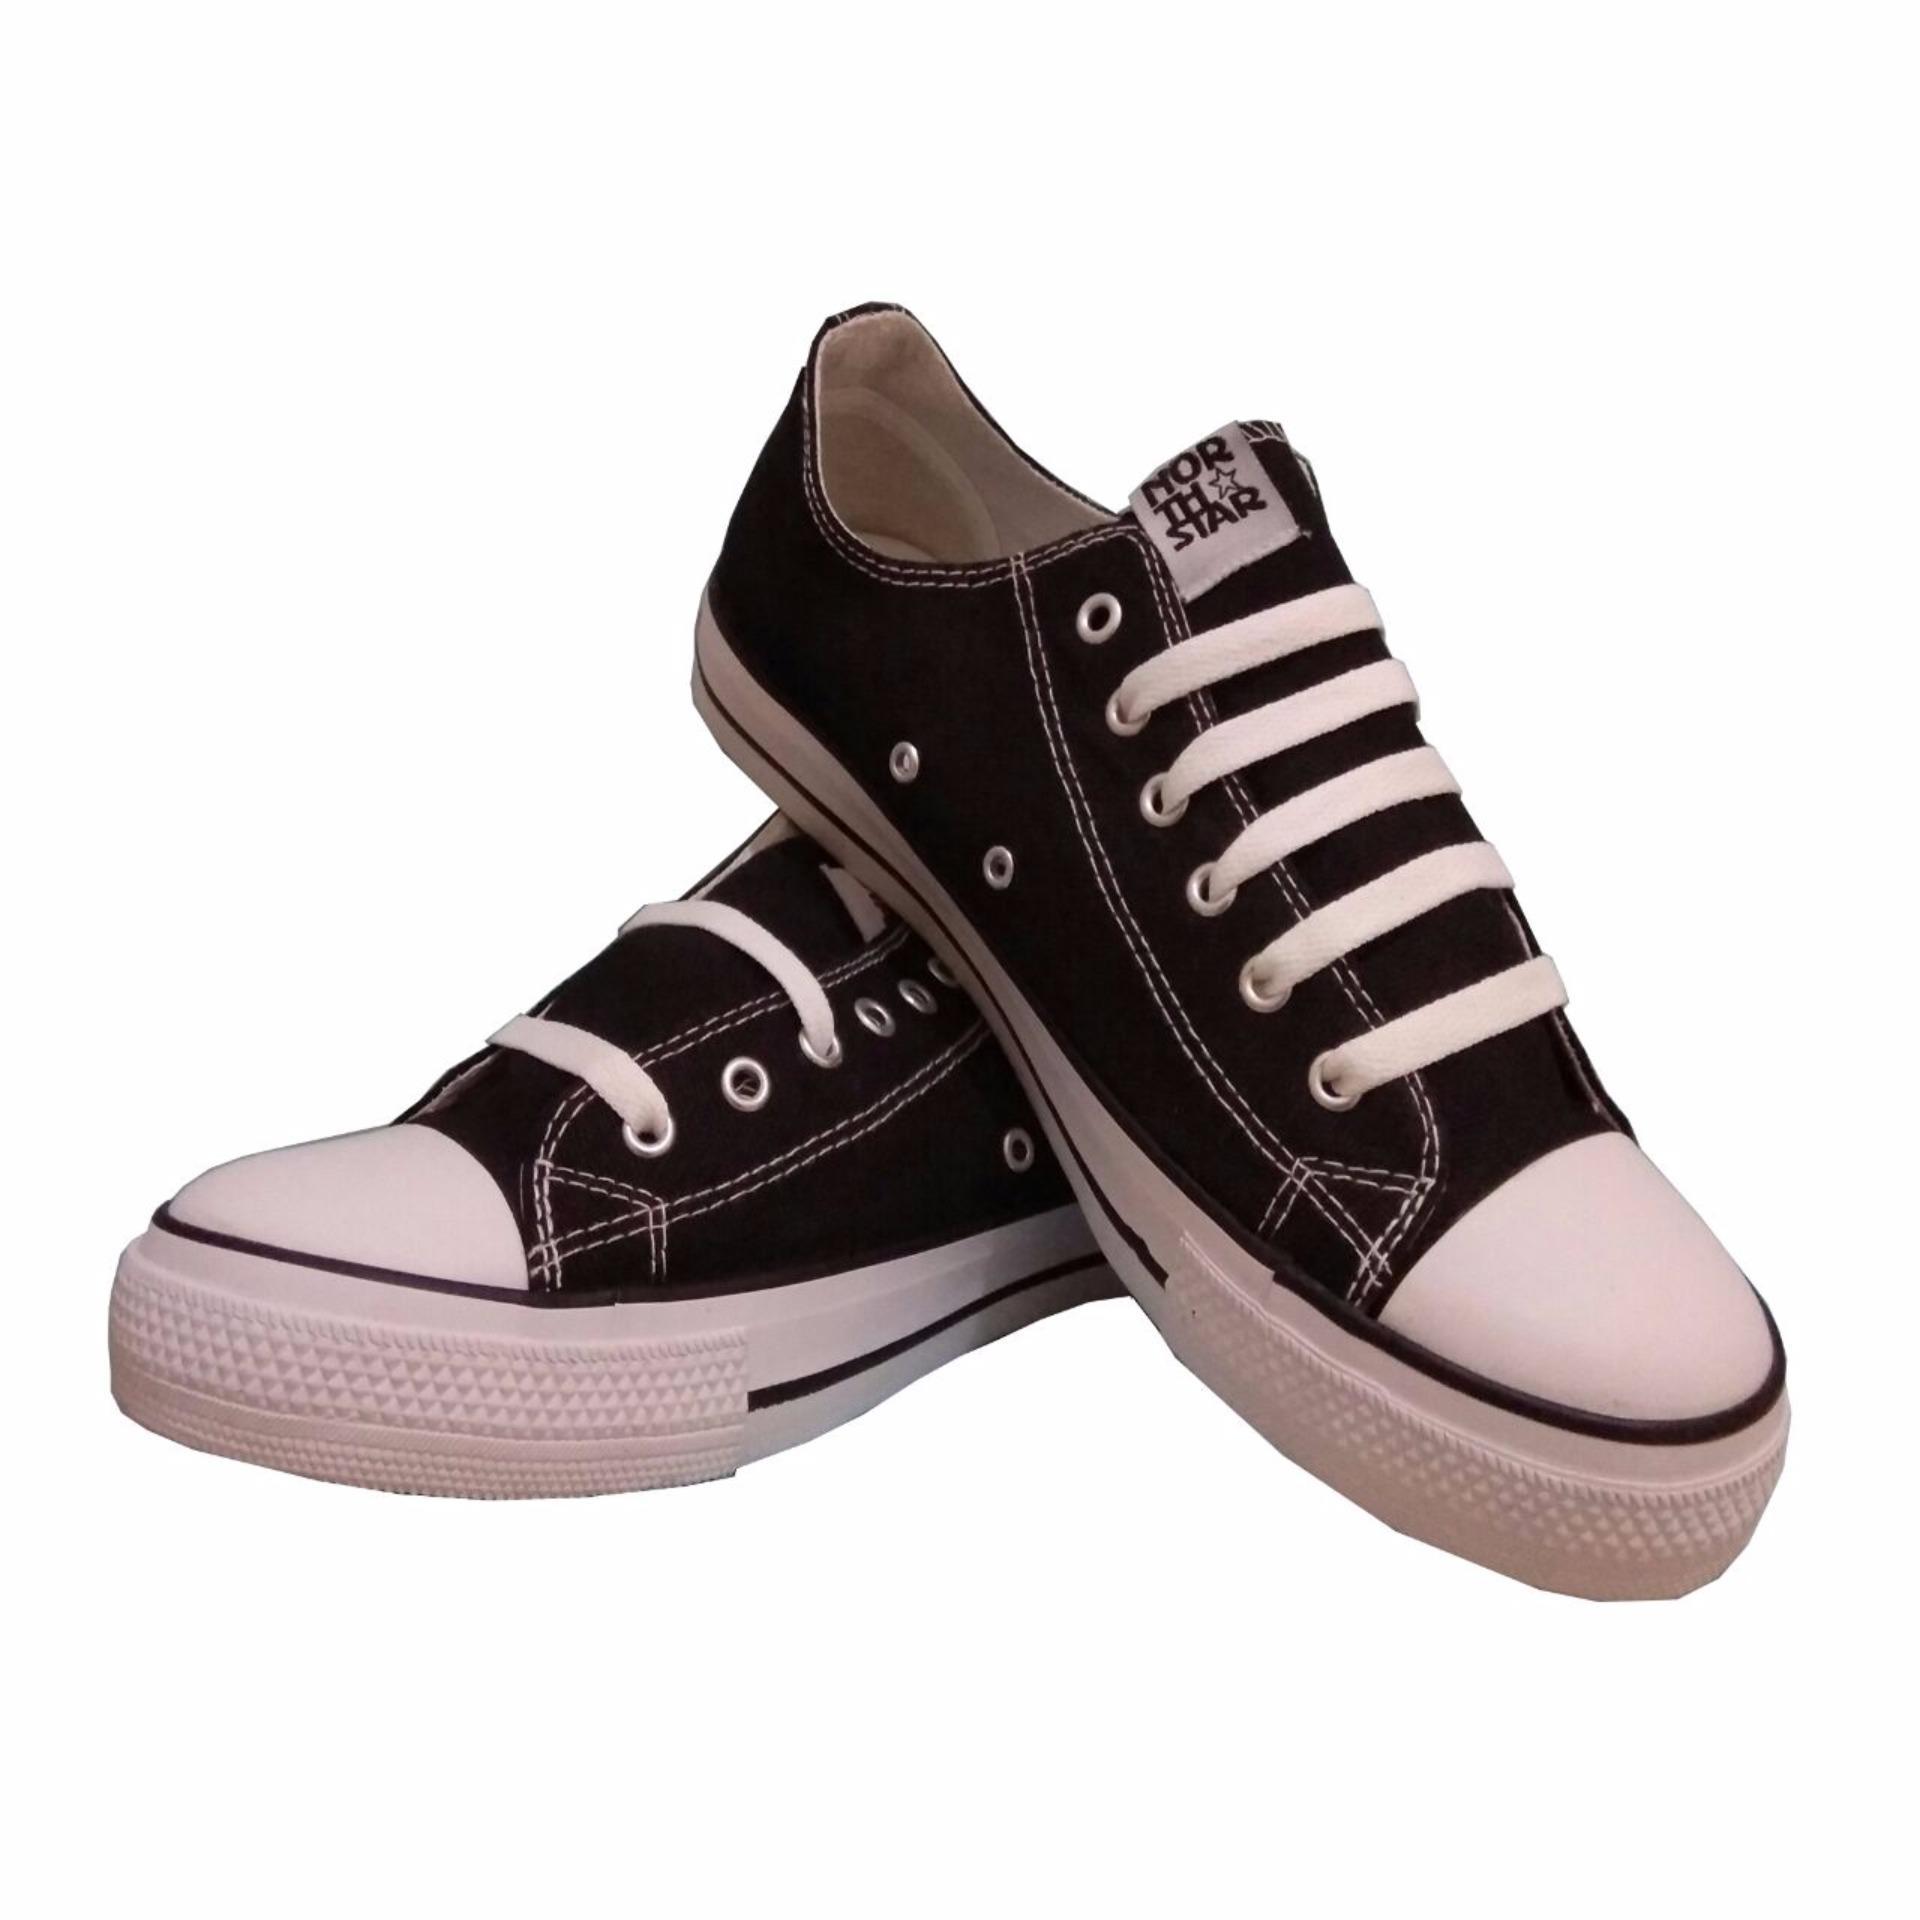 Sepatu Sekolah Warrior Athena High Cut Hitamputih Daftar Harga North Star Low Black White